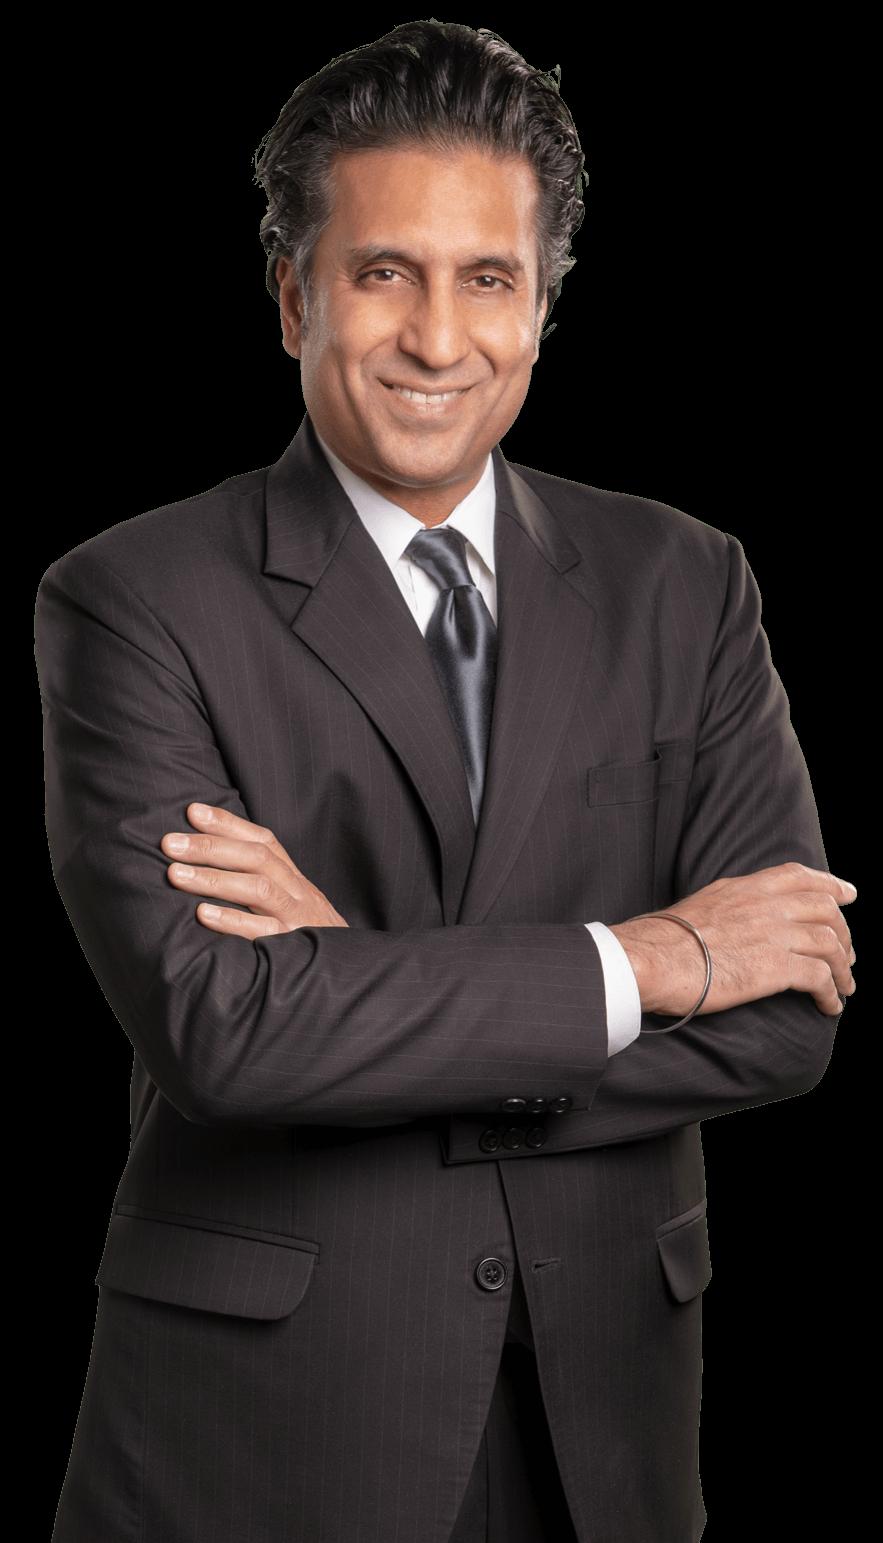 Paul Padda Law Personal Injury Attorney